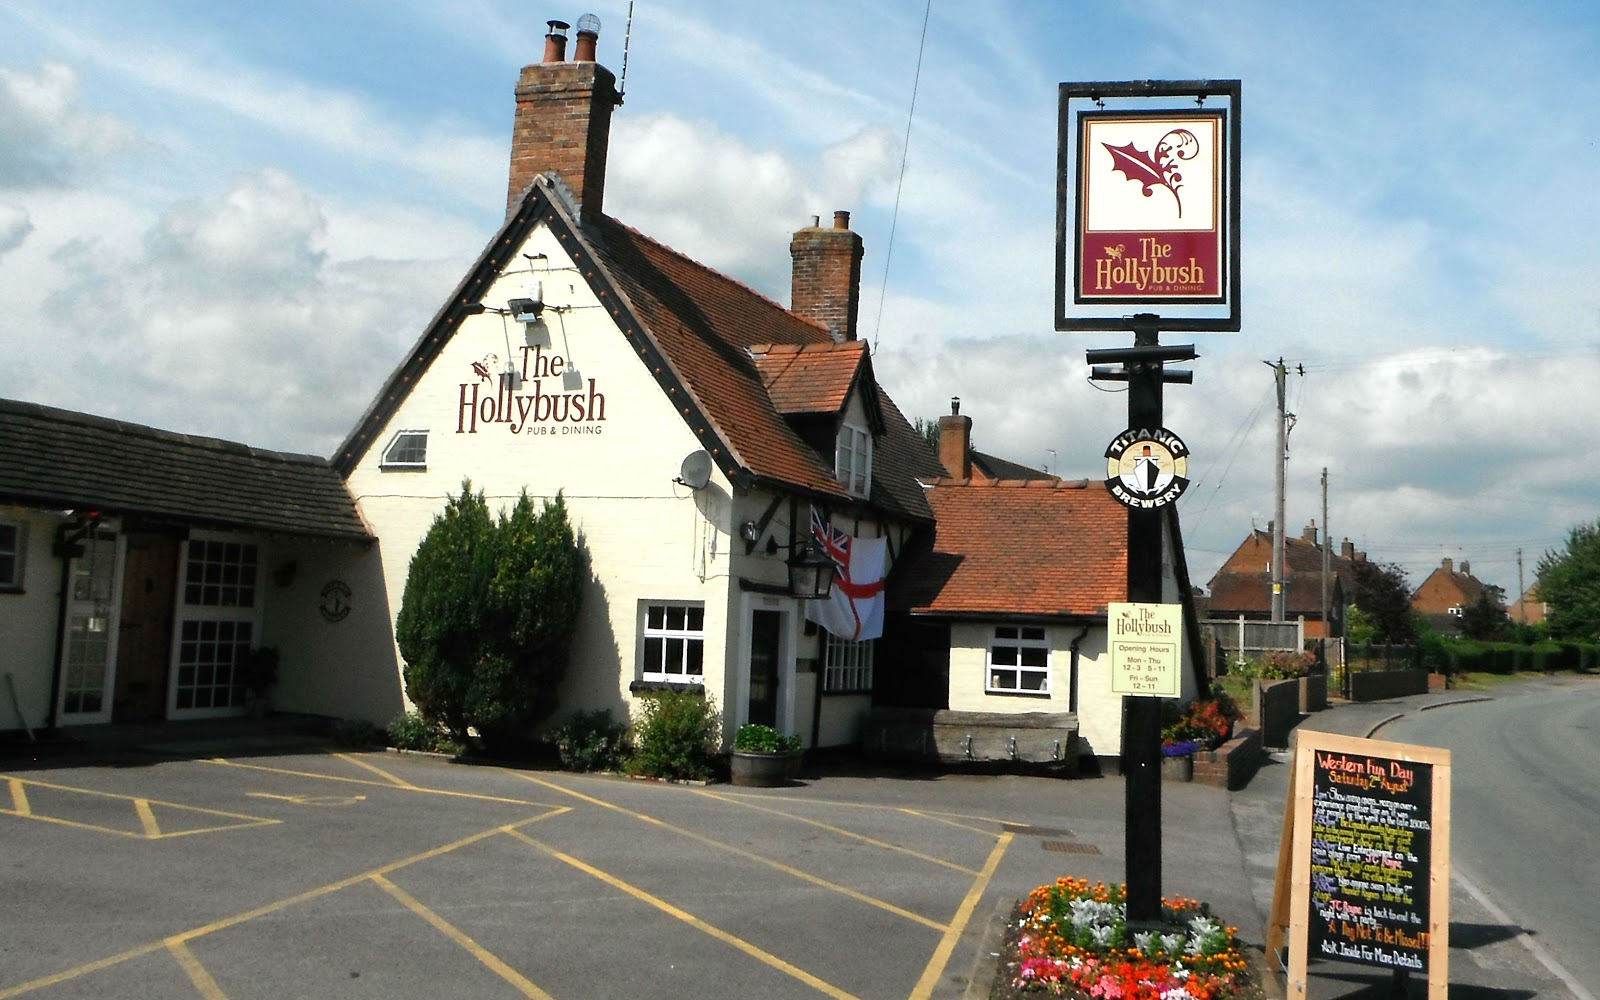 The Hollybush Pub at Seighford